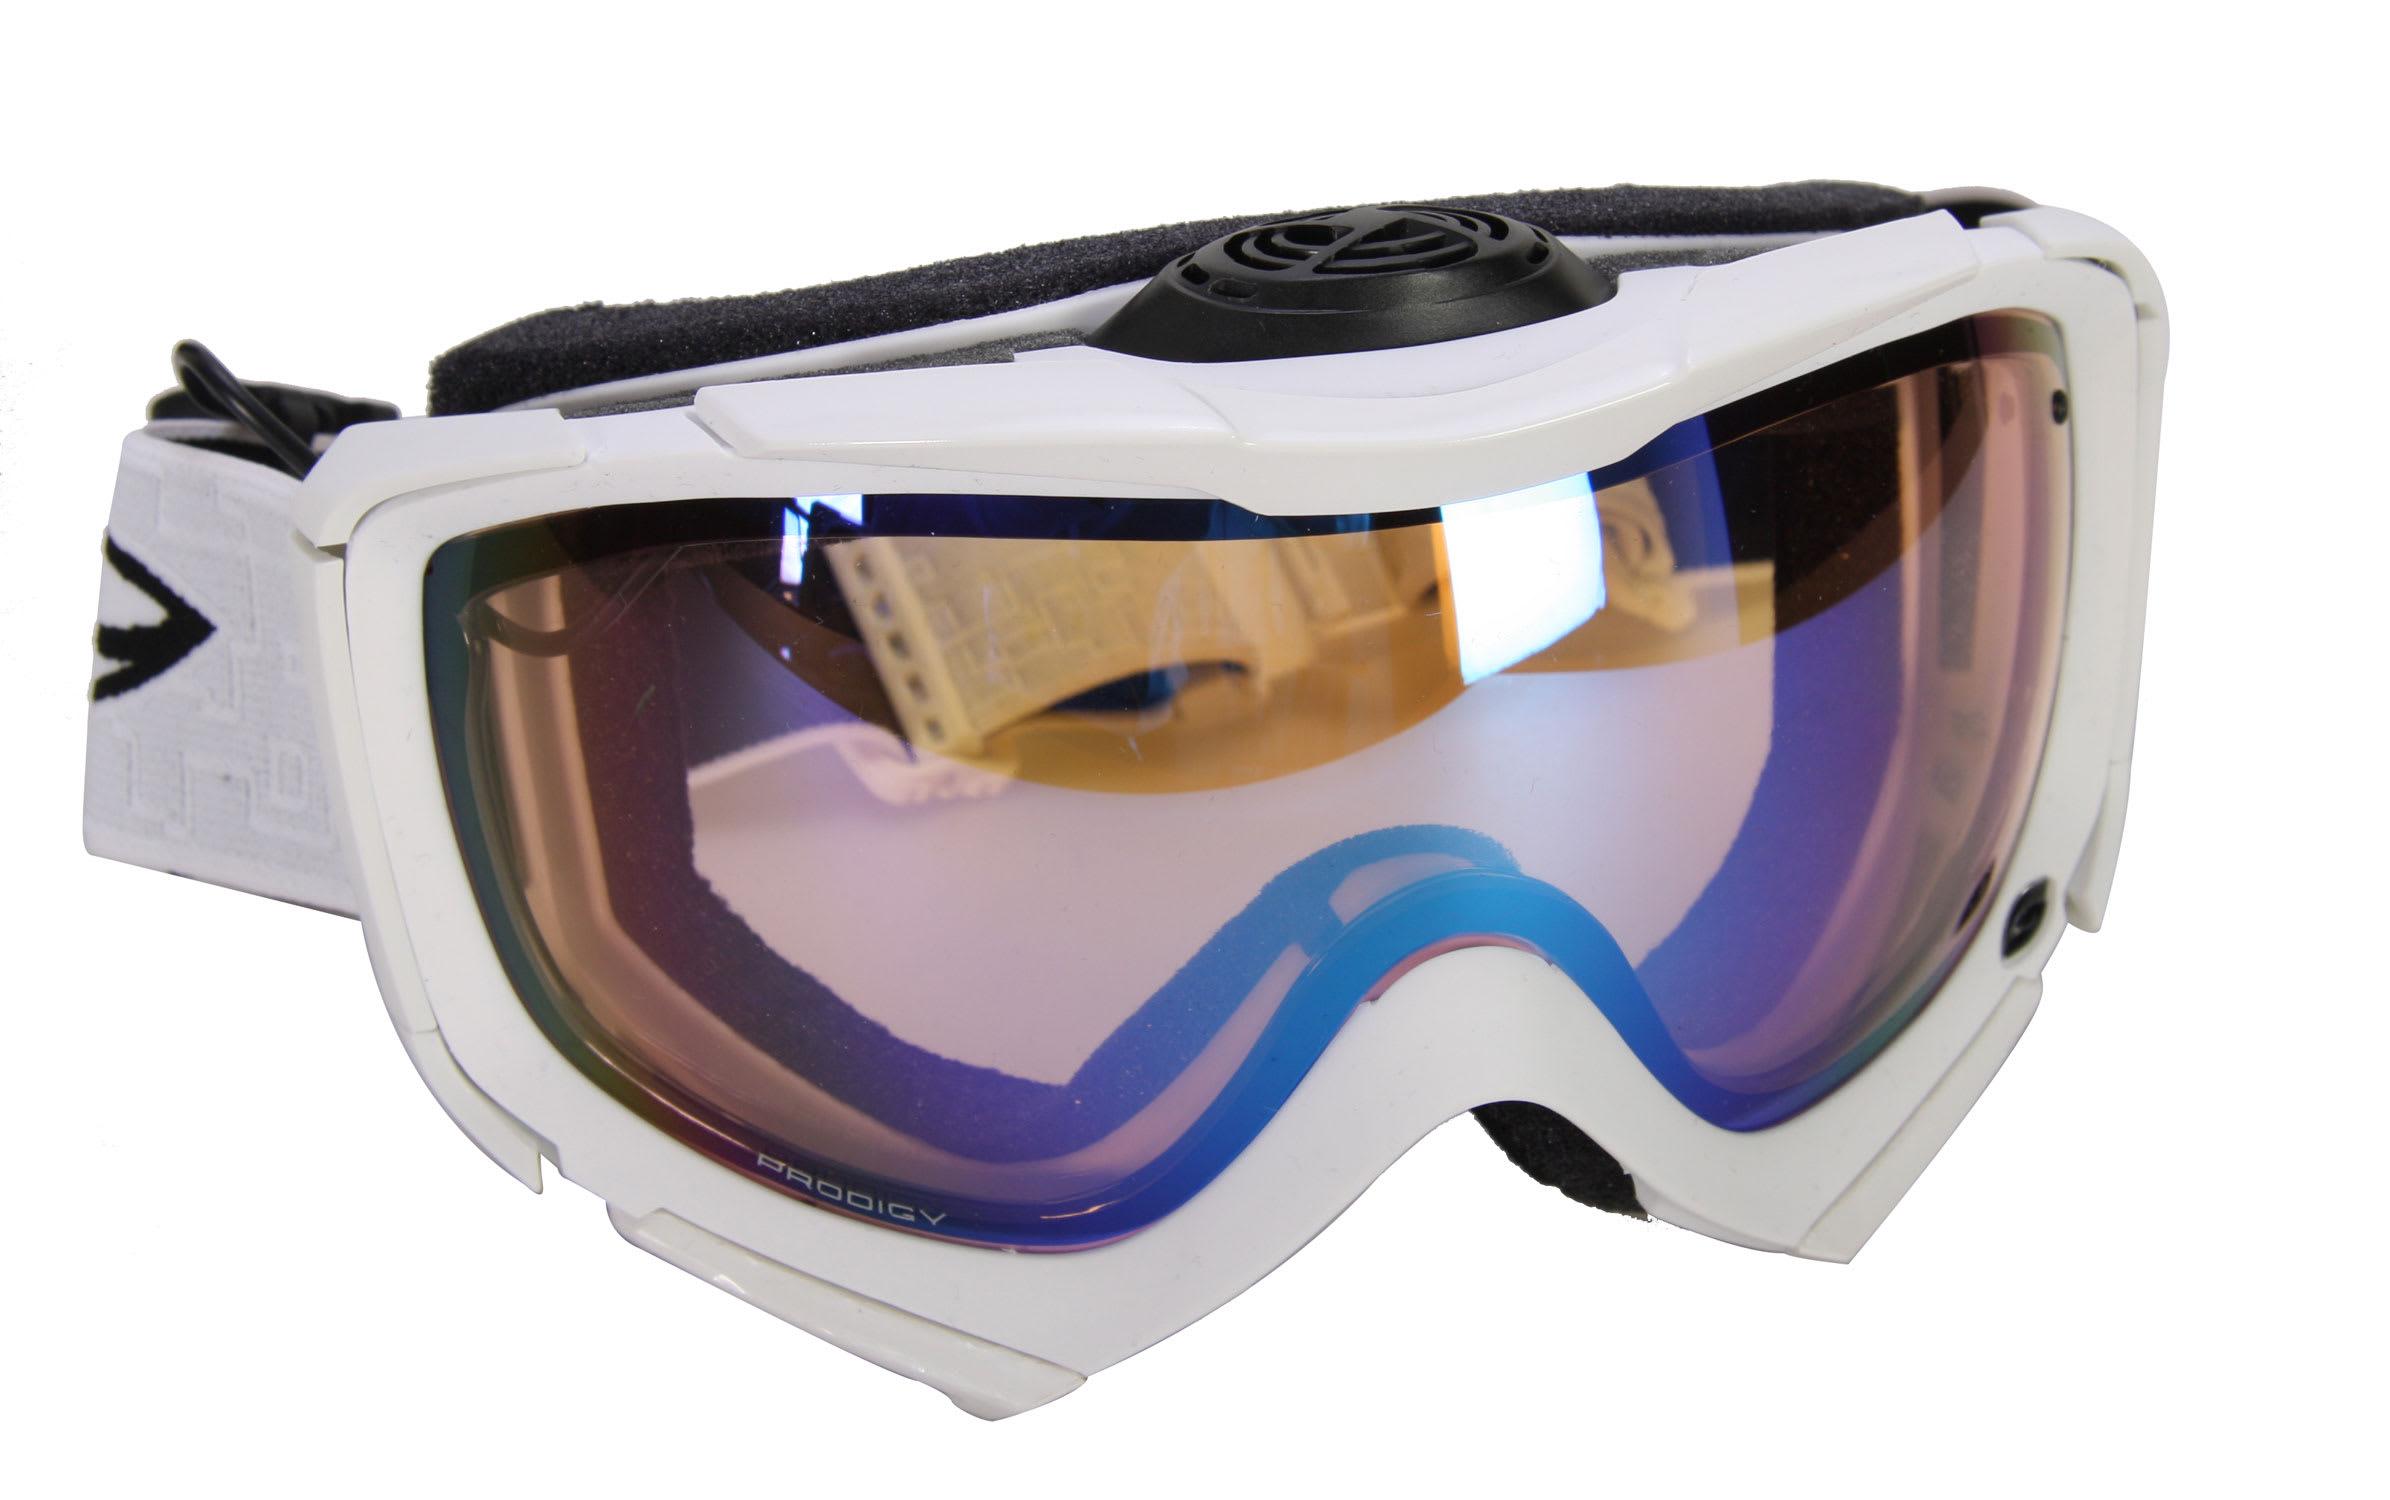 77e8749dd3 Smith Prodigy Turbo Fan Goggles - thumbnail 1